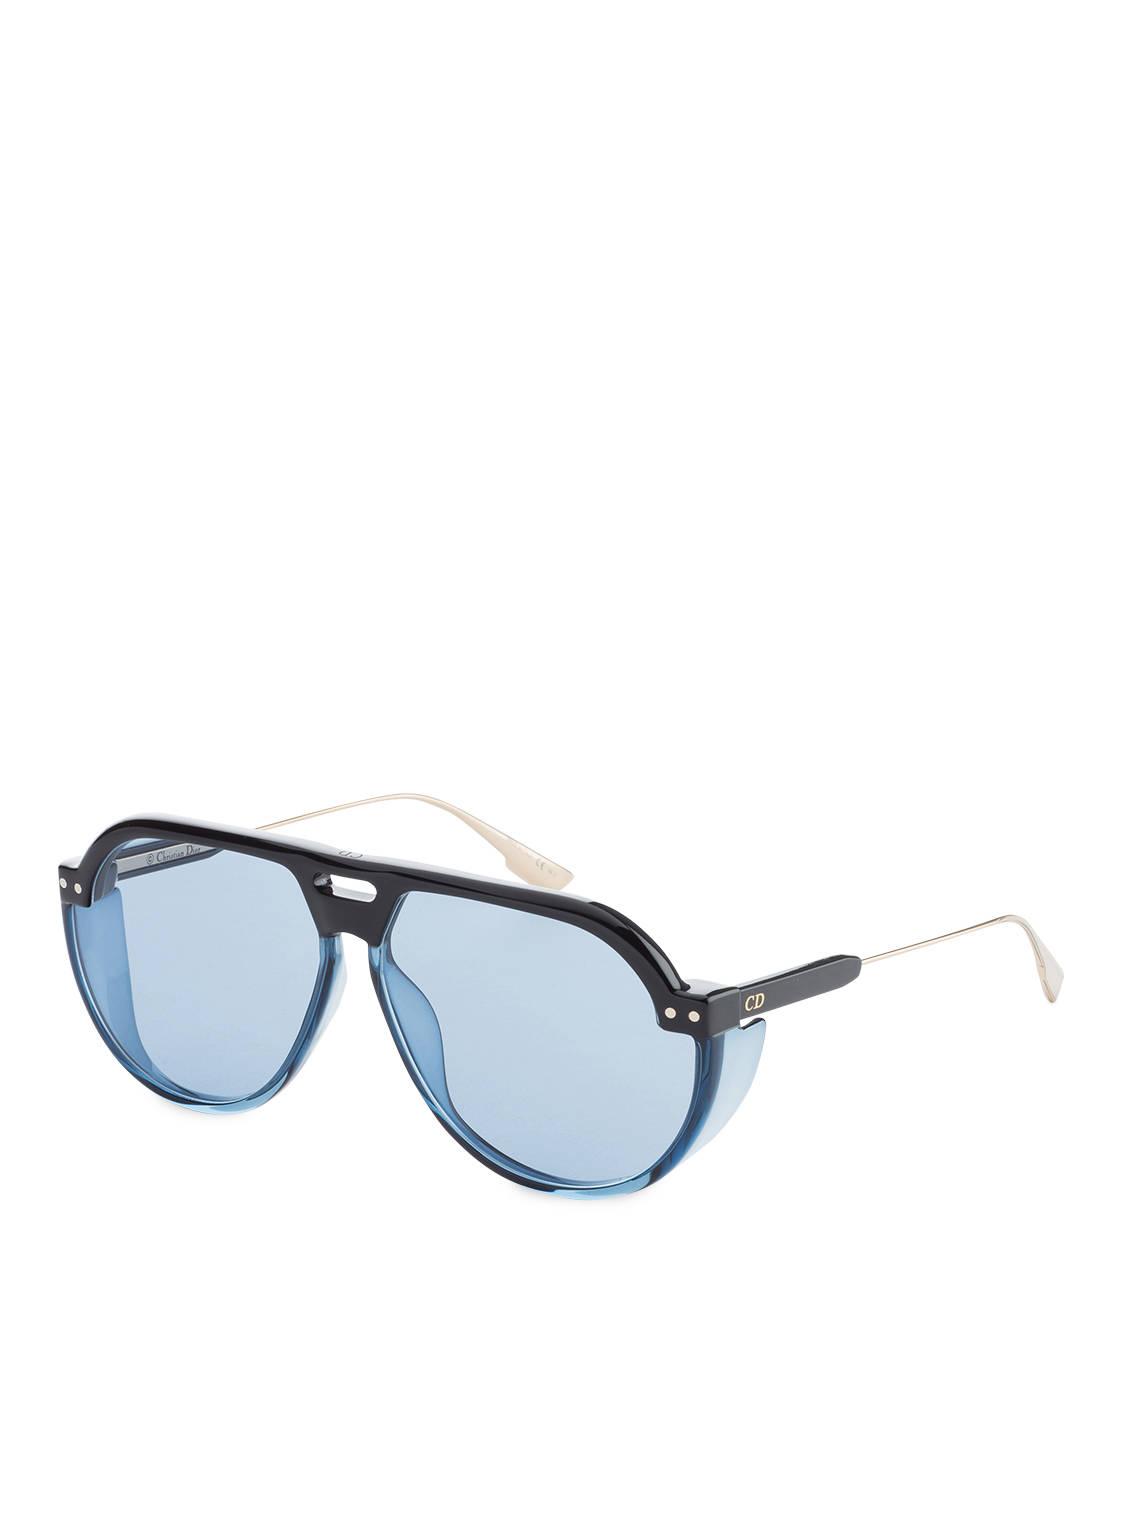 Sunglasses Sonnenbrille DIORCLUB3